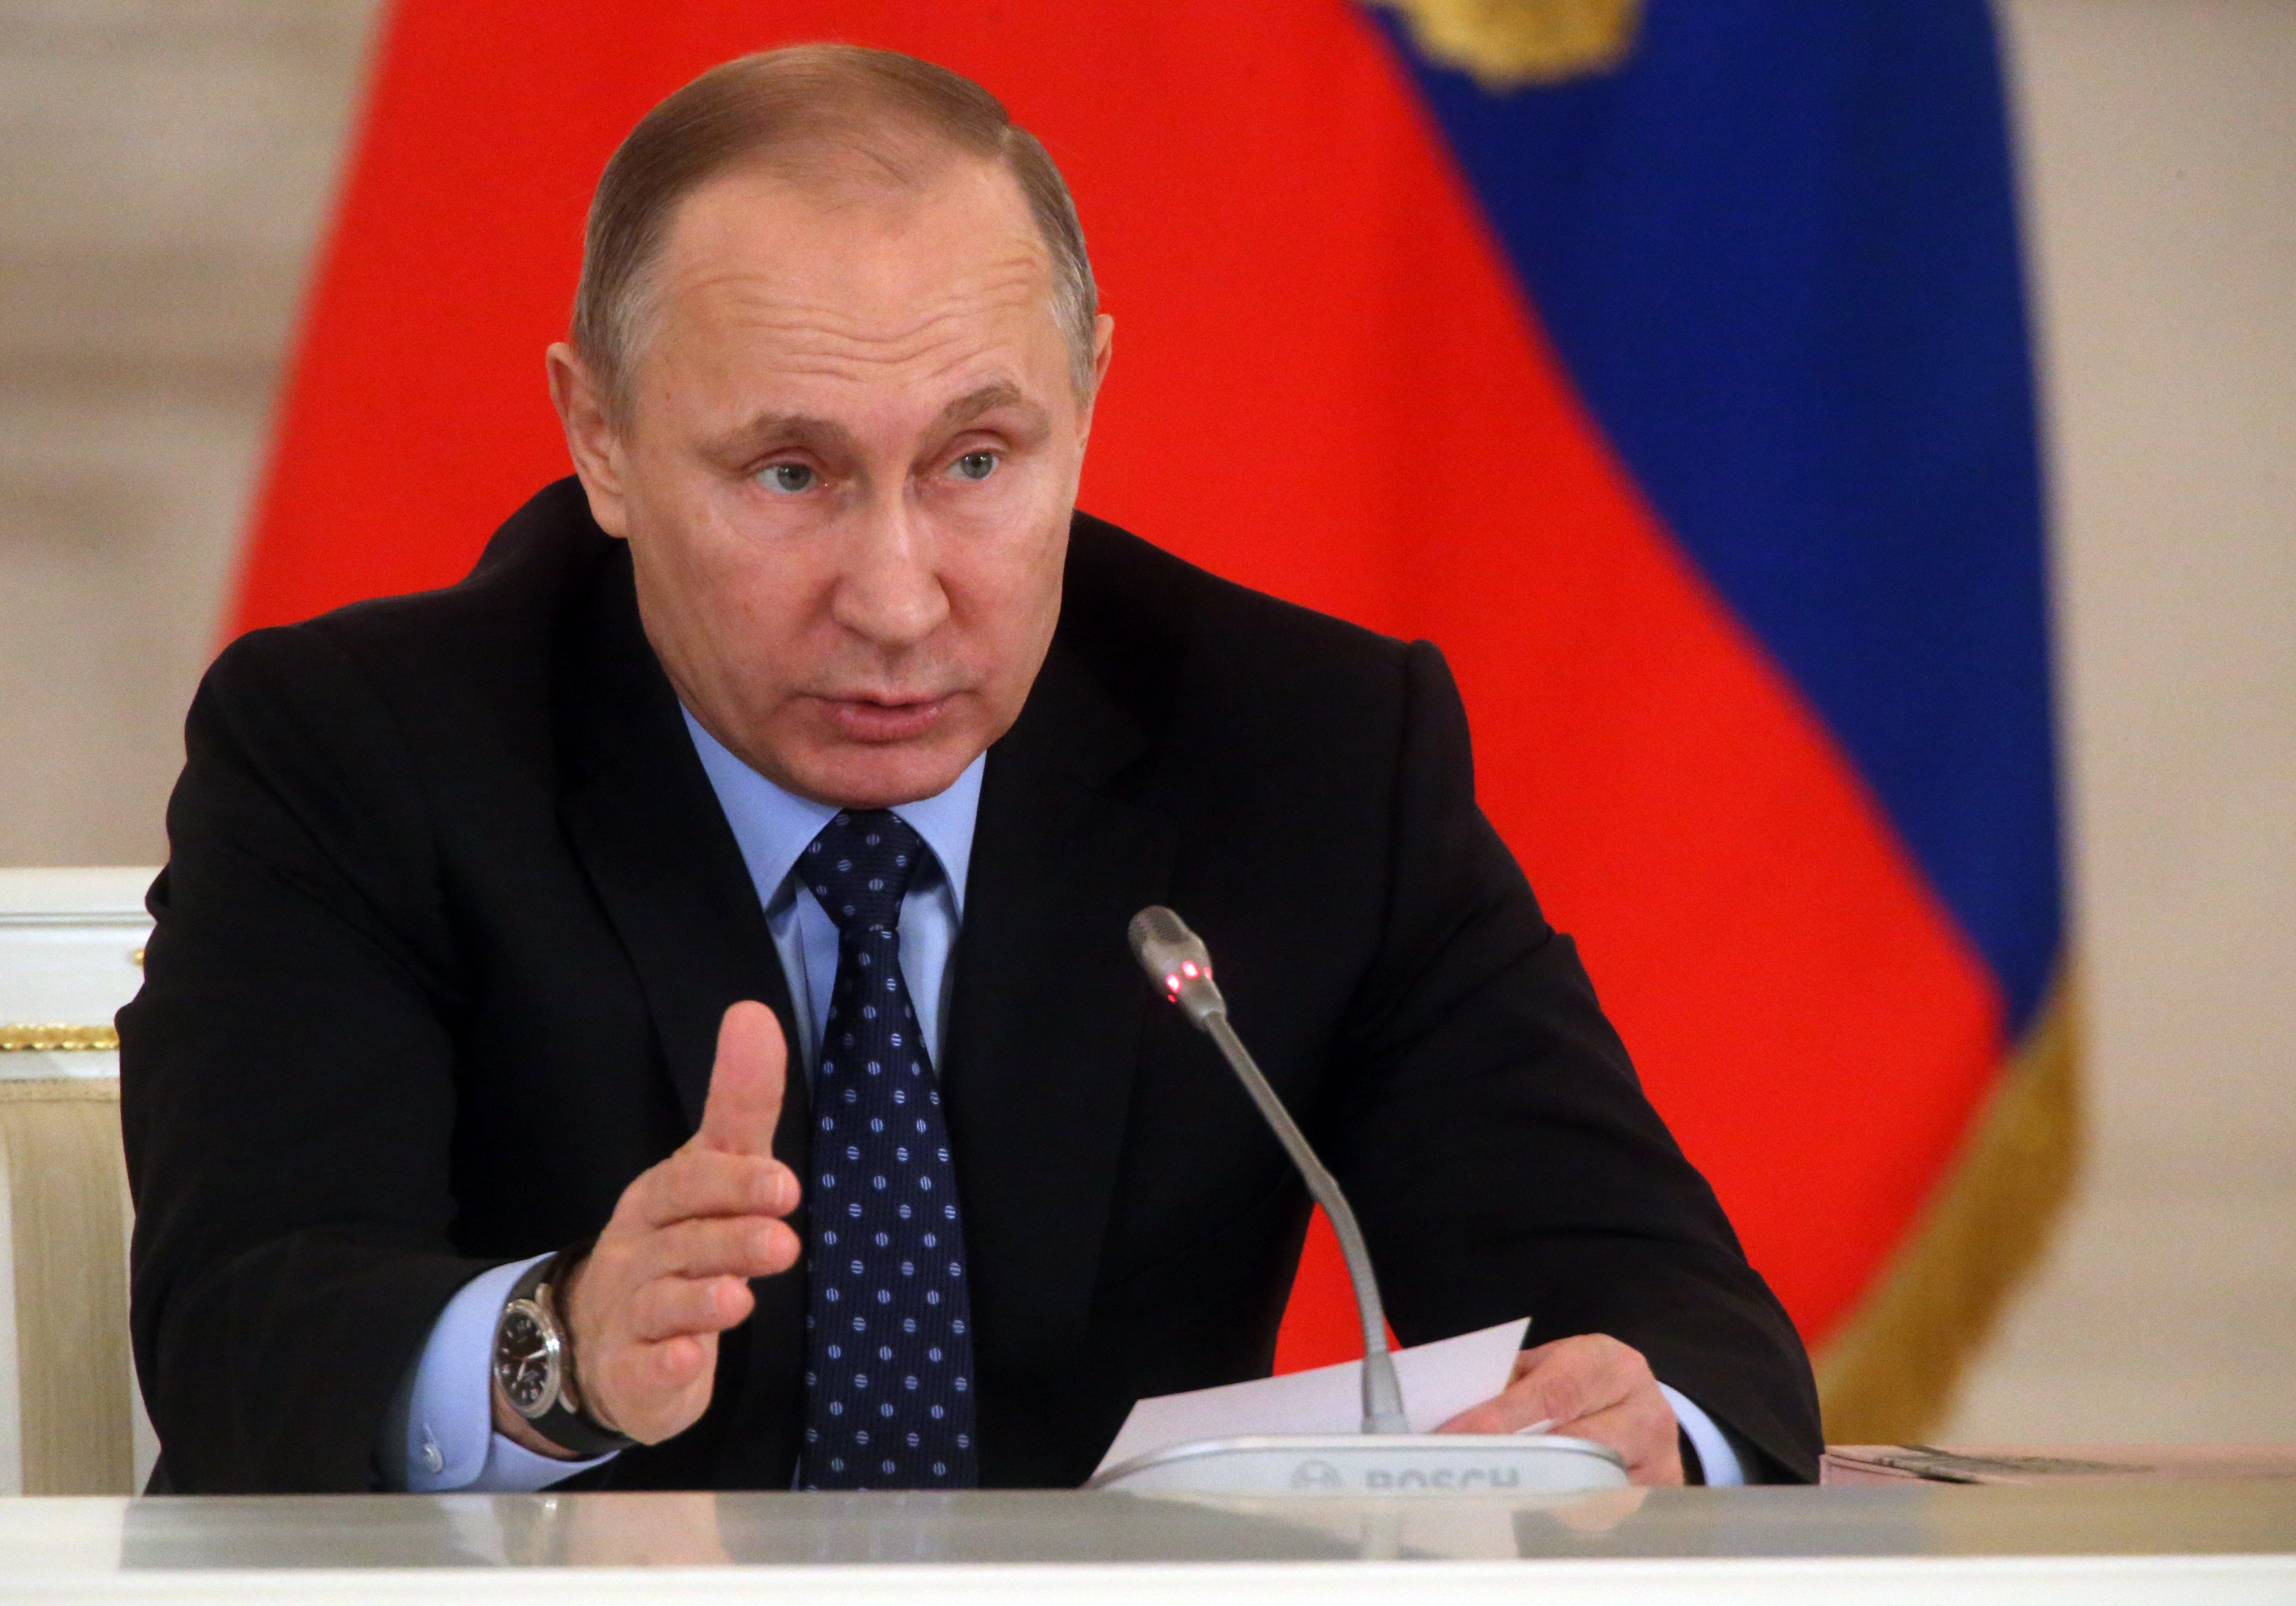 Russian President Vladimir Putin Holds State Council Meeting At Kremlin